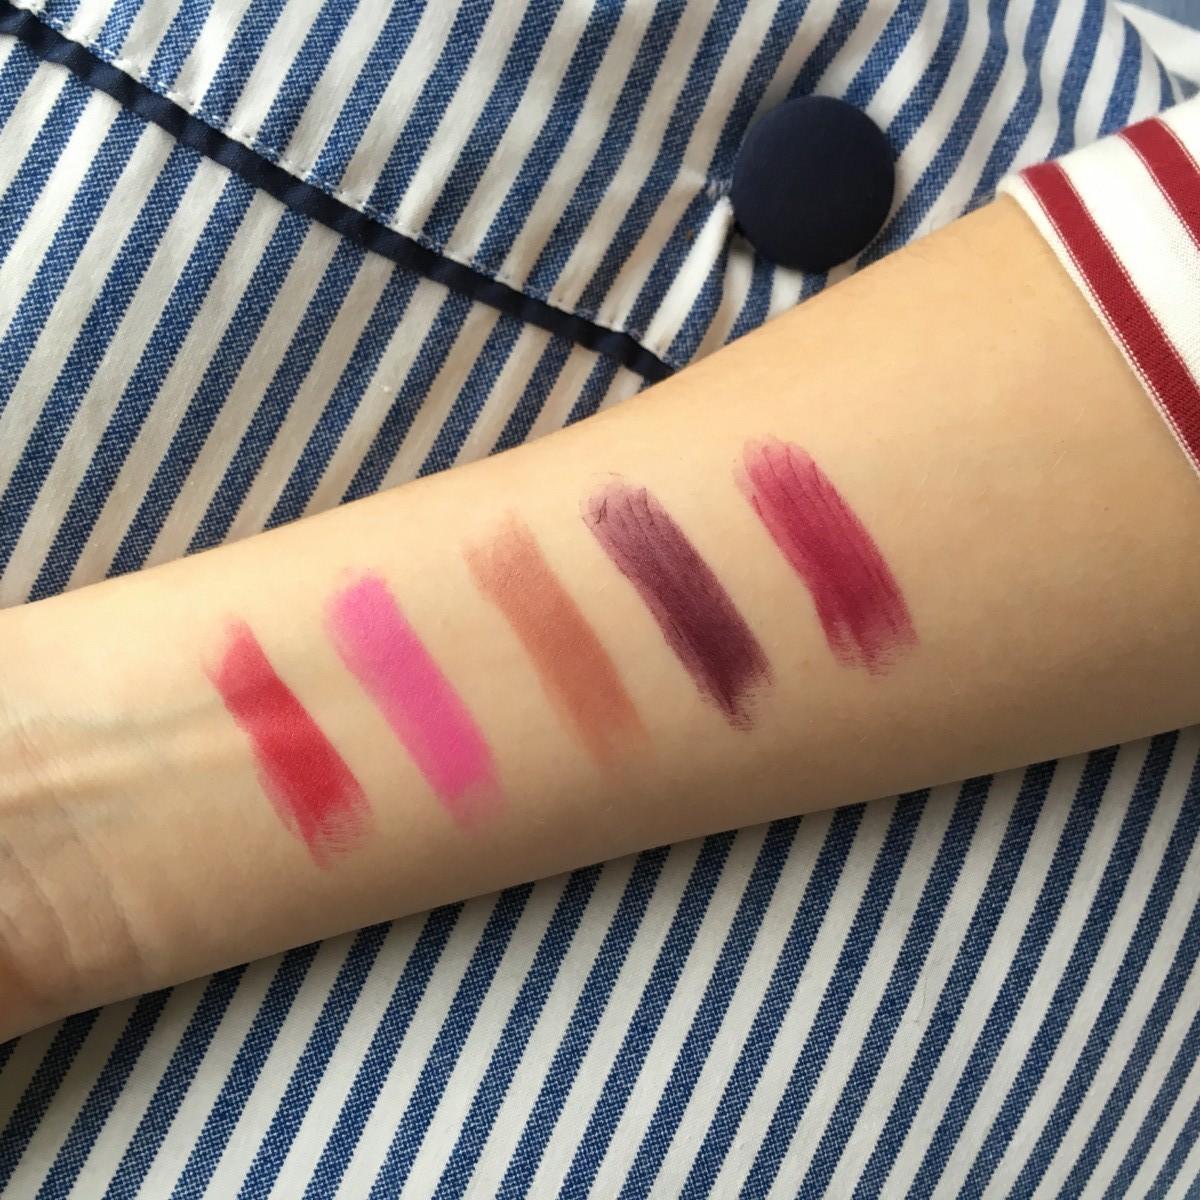 makeup revolution lipsticks